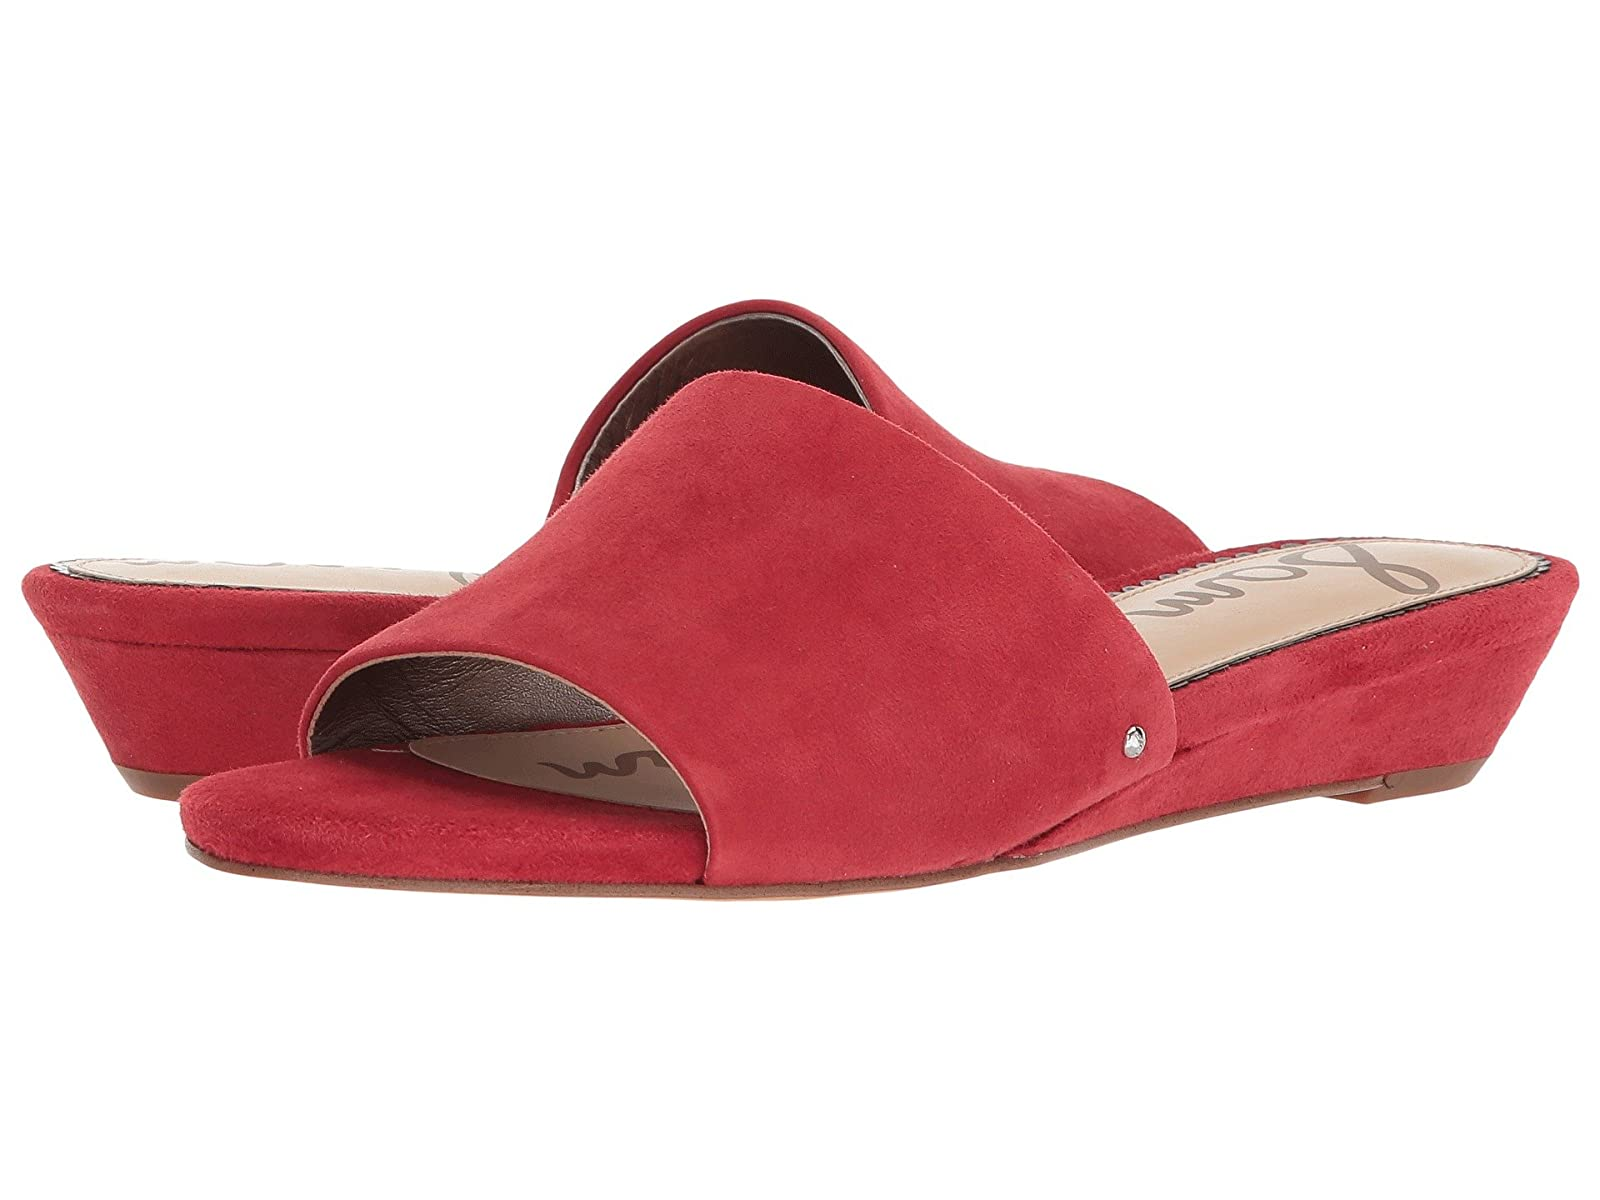 Sam Edelman LilianaCheap and distinctive eye-catching shoes